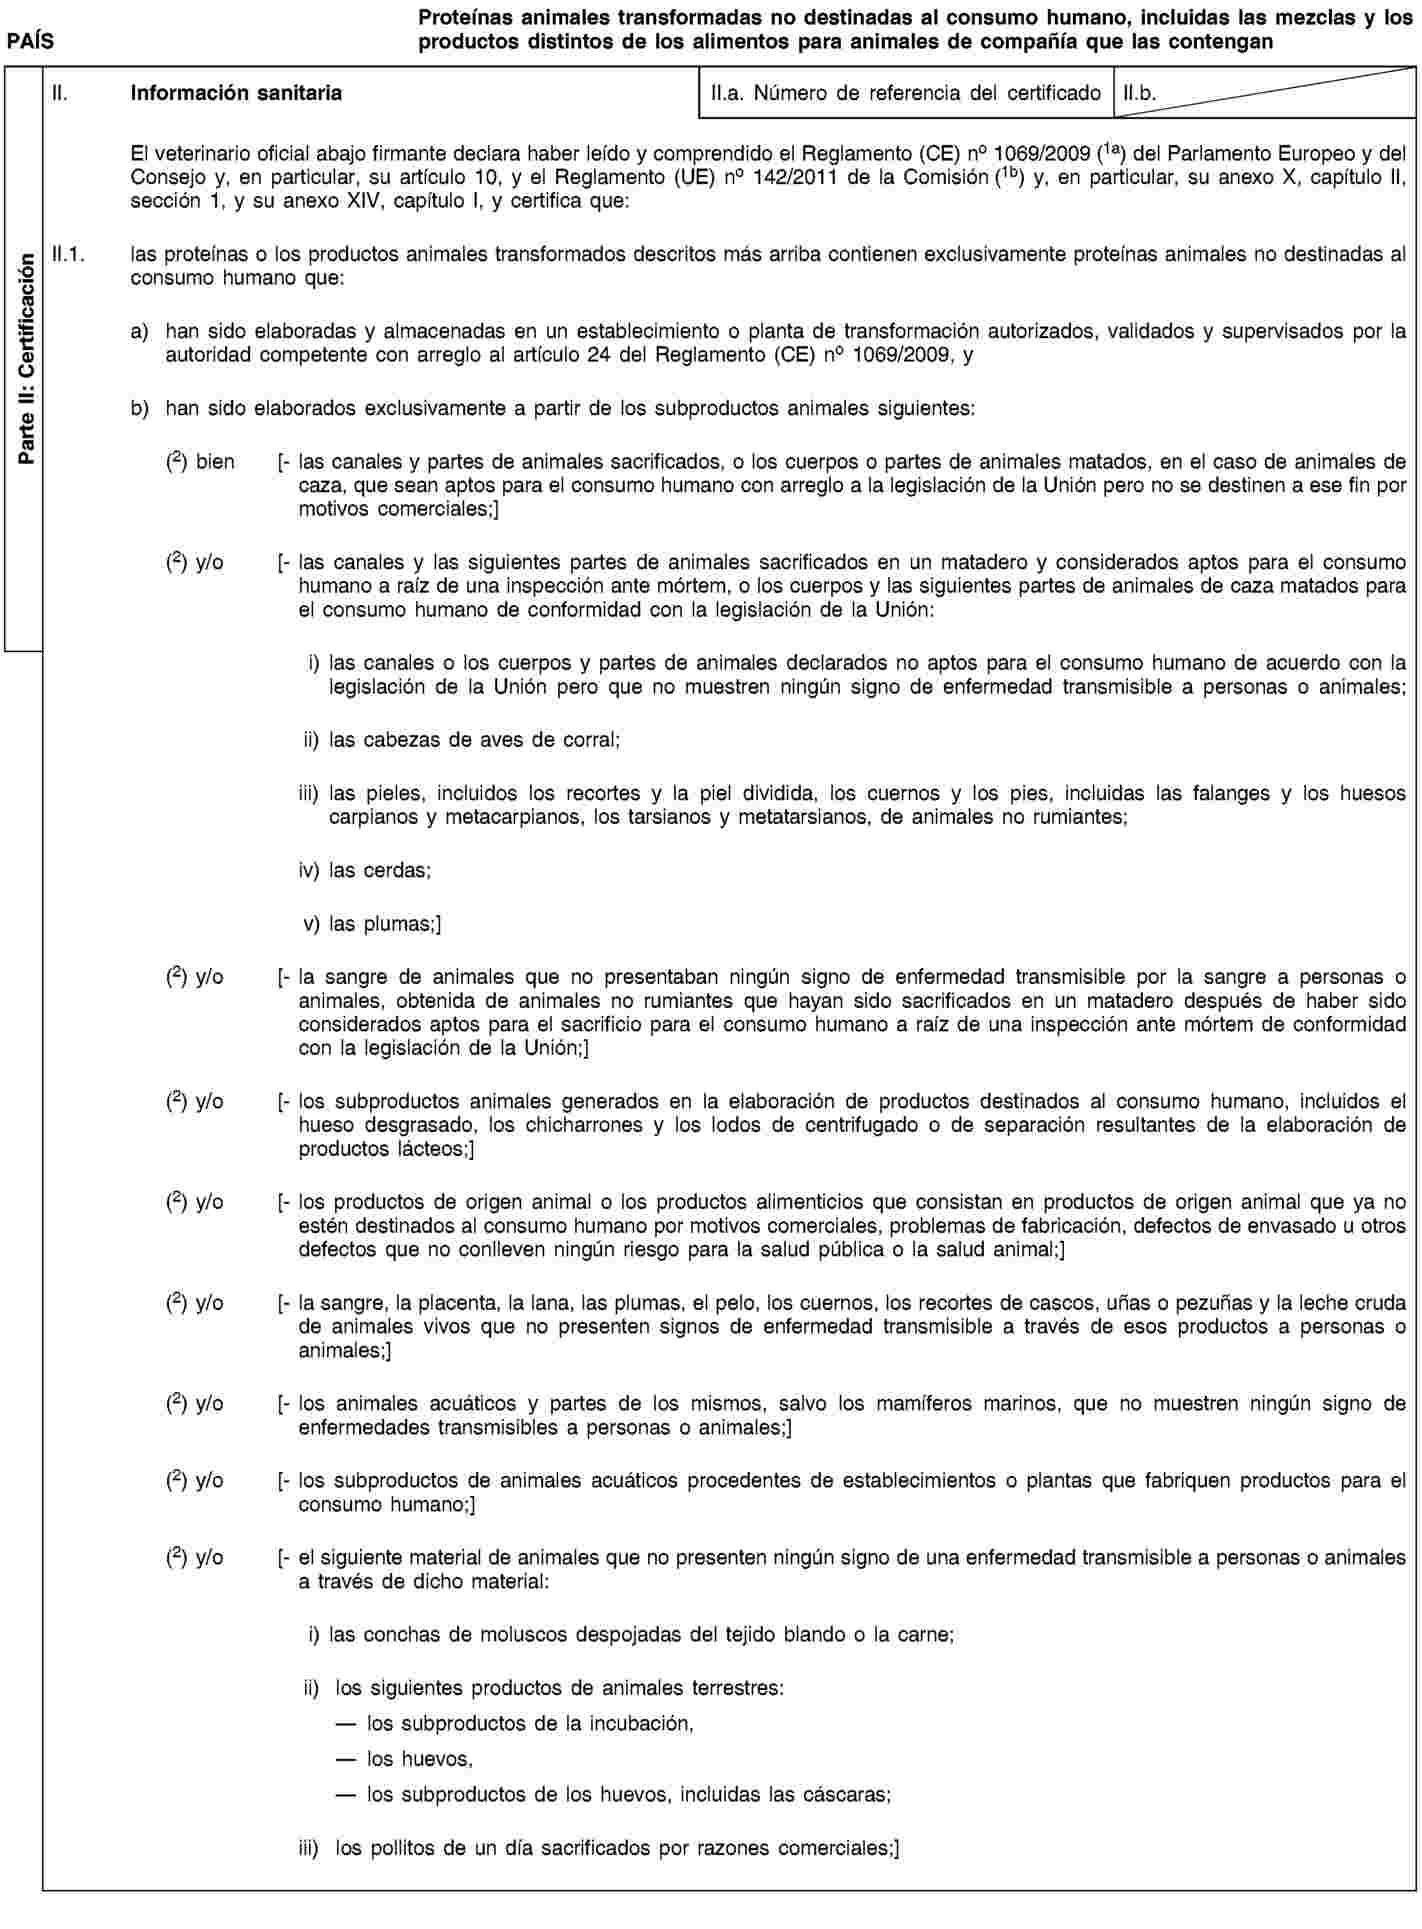 Imagen: https://eur-lex.europa.eu/resource.html?uri=uriserv:OJ.L_.2011.054.01.0001.01.SPA.xhtml.L_2011054ES.01012101.tif.jpg